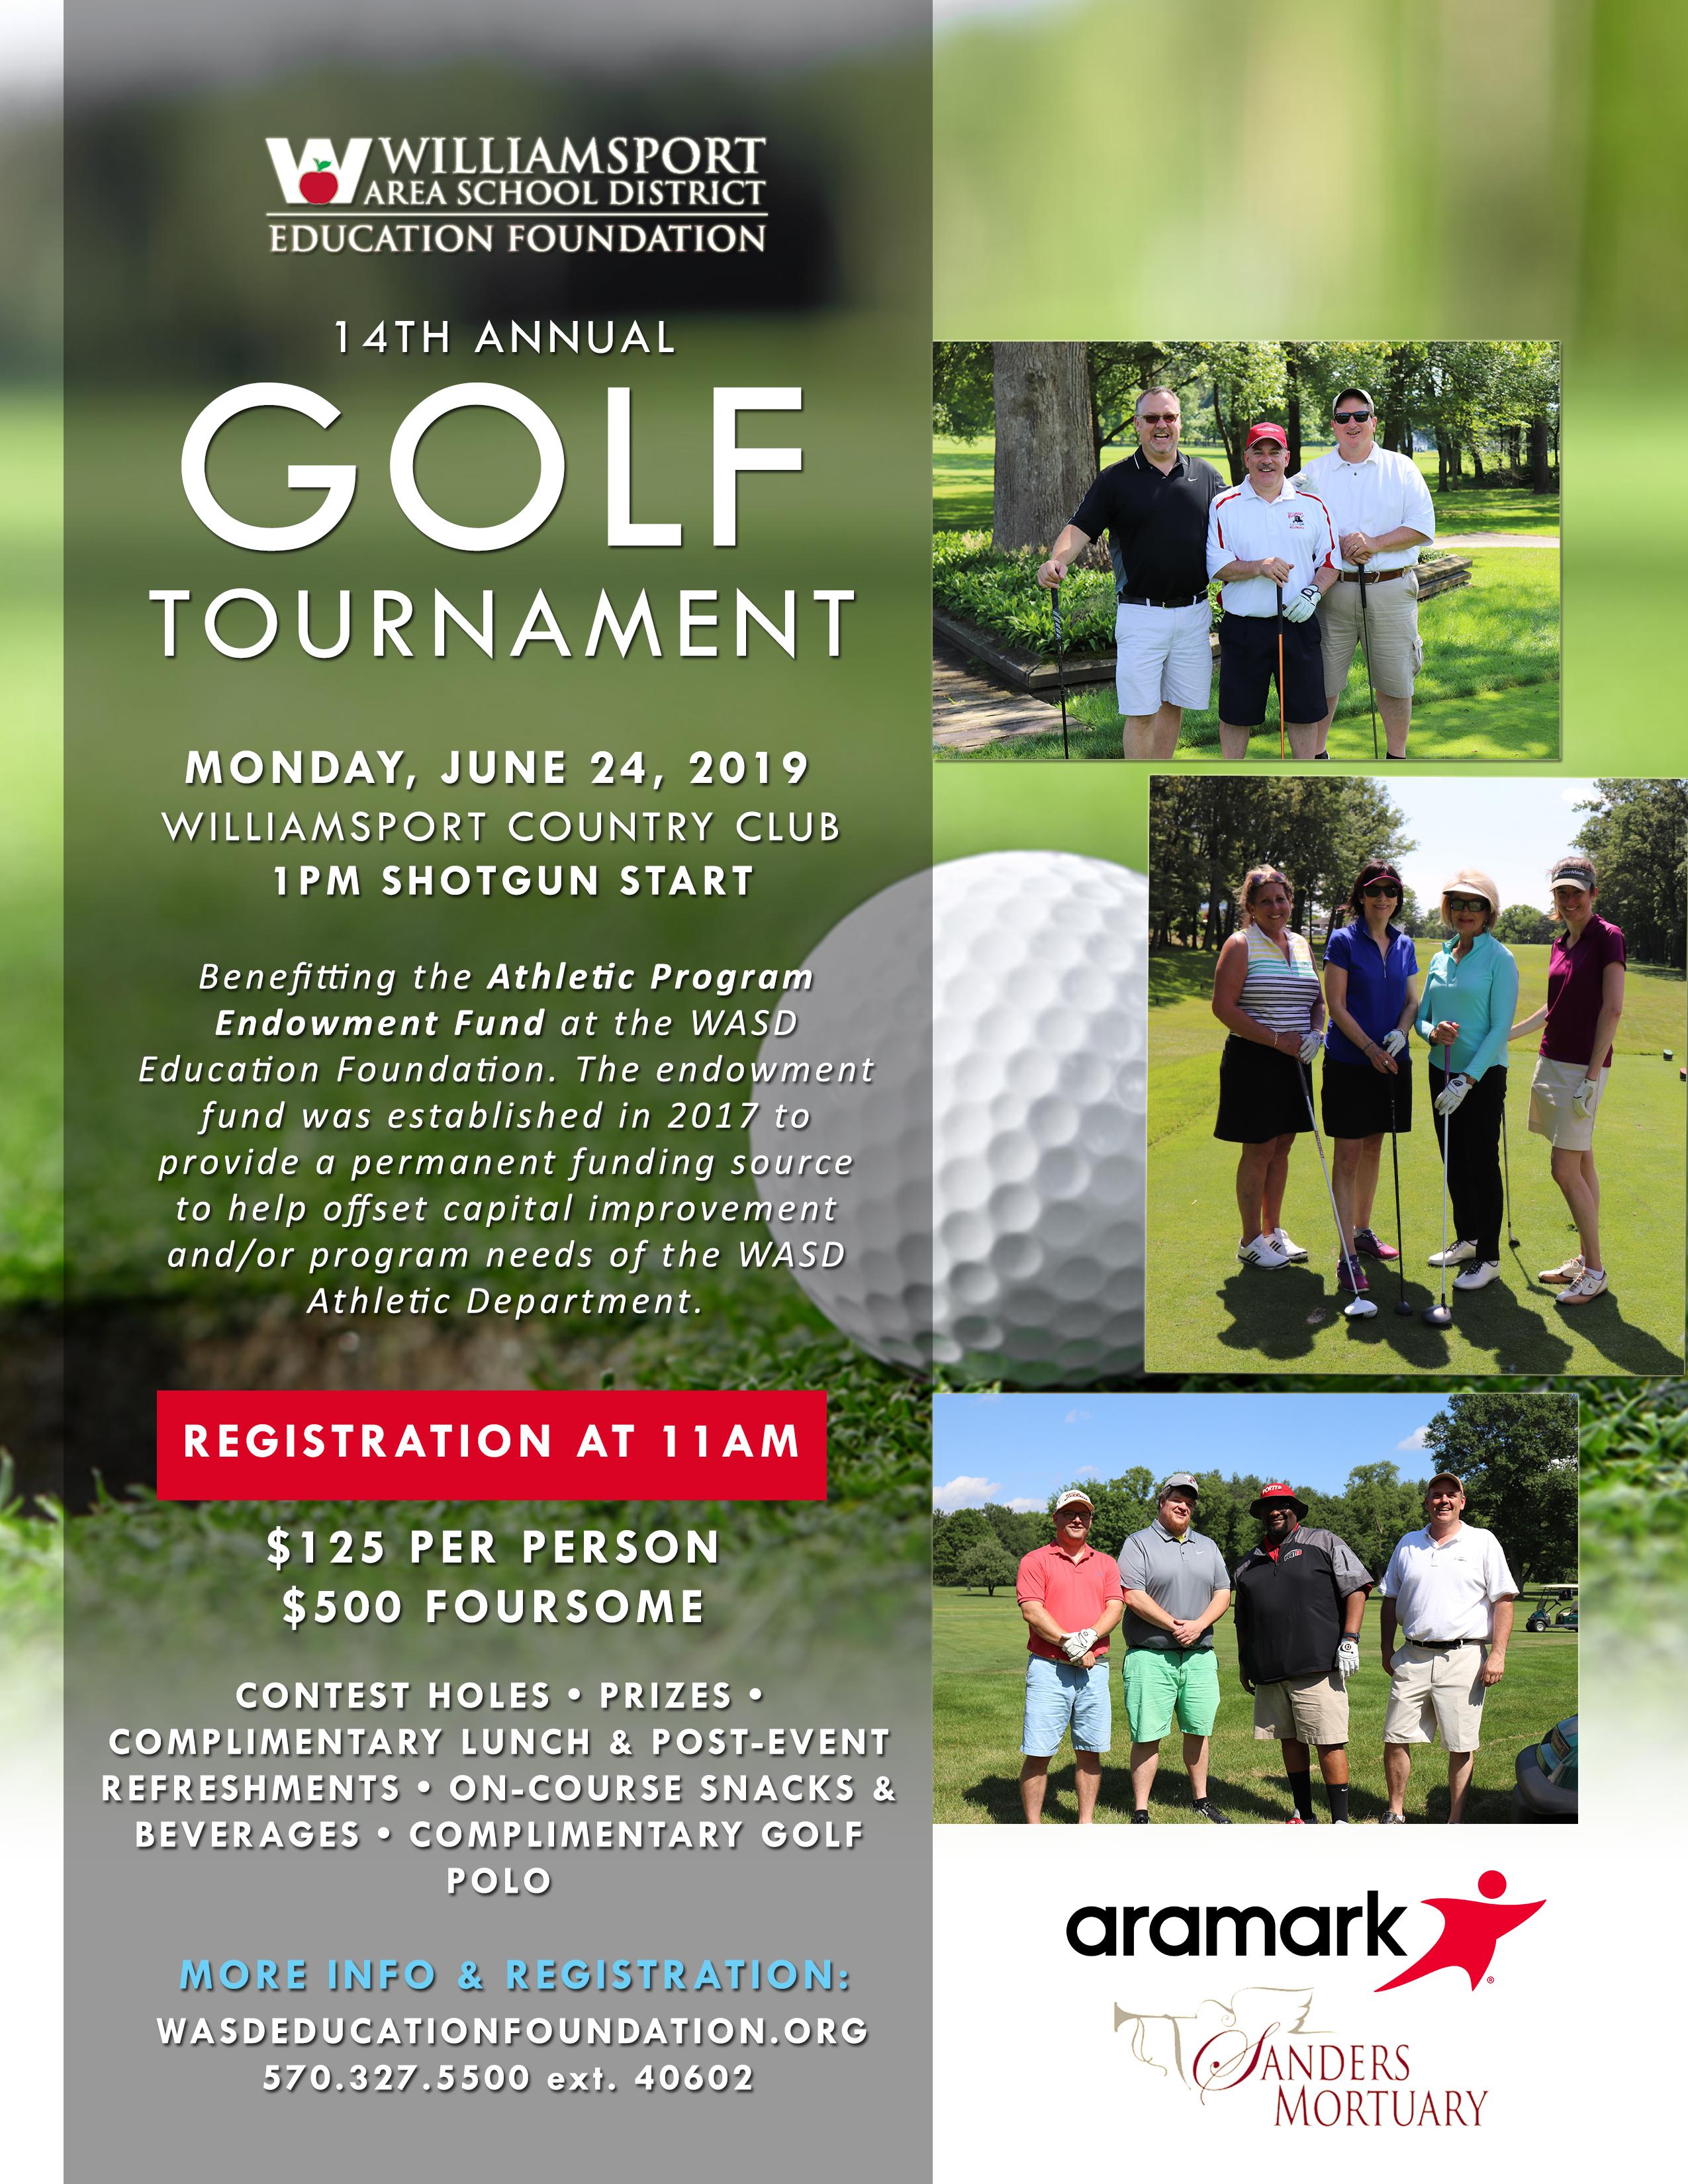 WASDEF Announces 14th Annual Golf Tournament Event Details